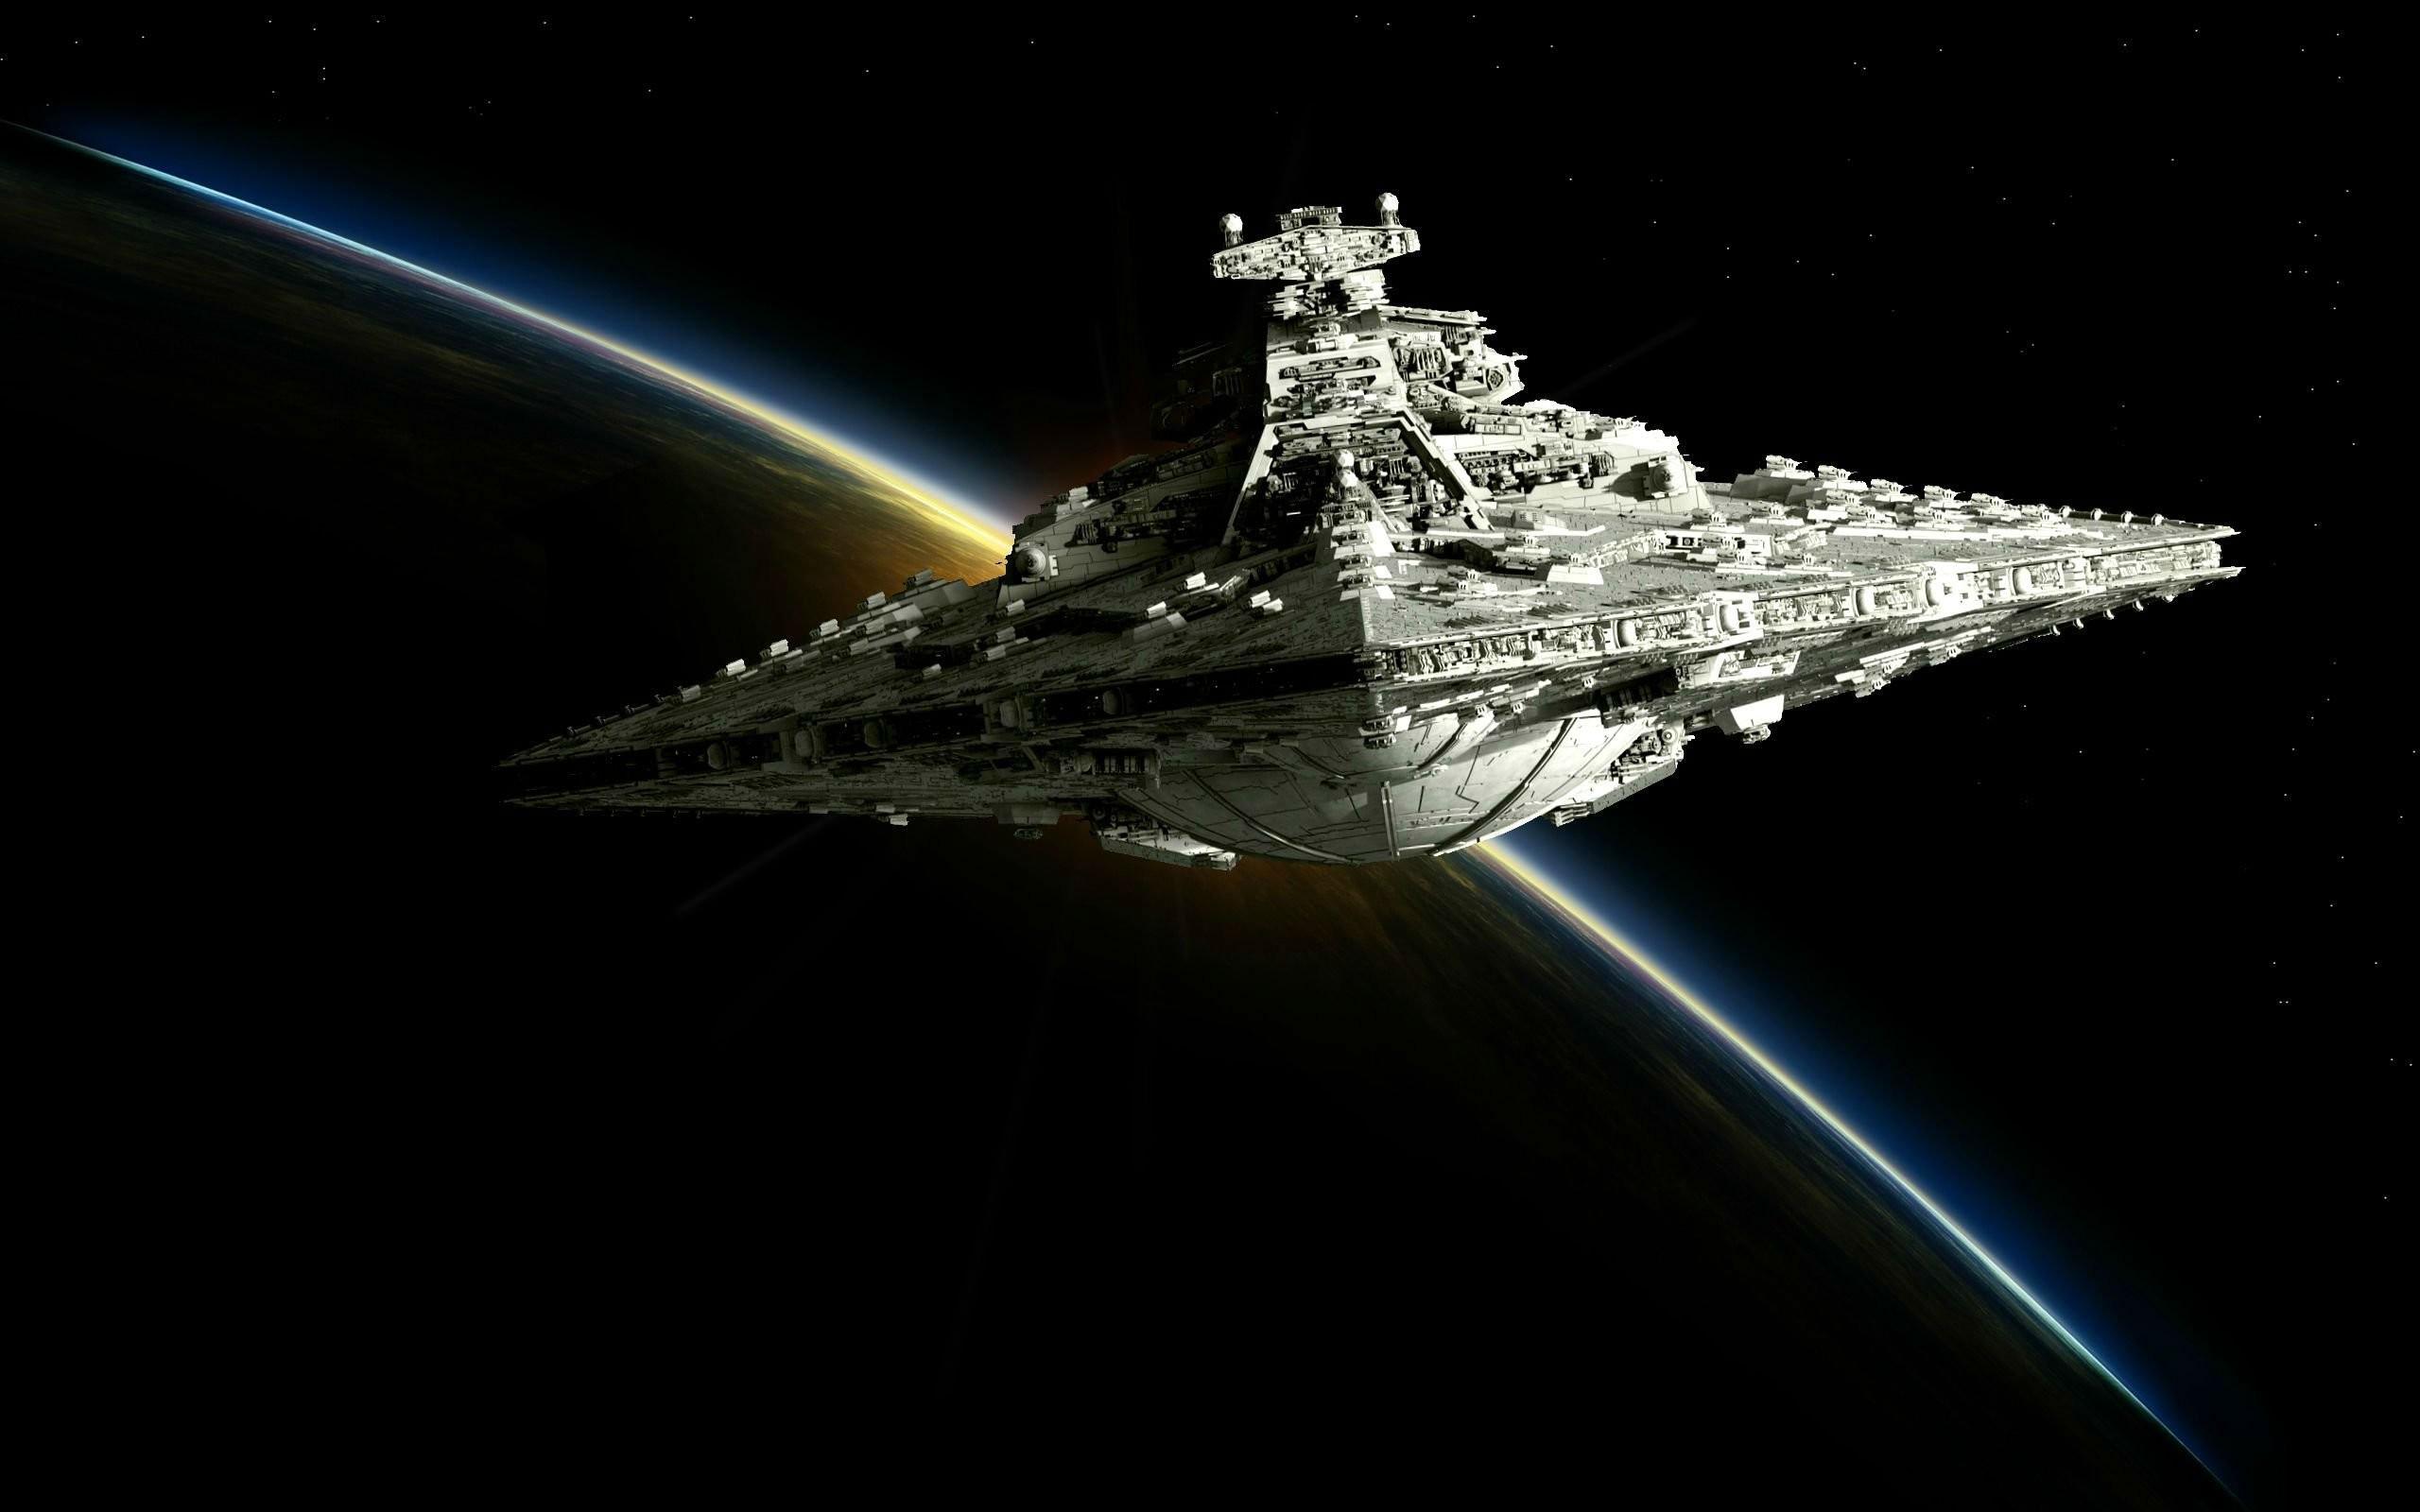 134 Star Wars Space